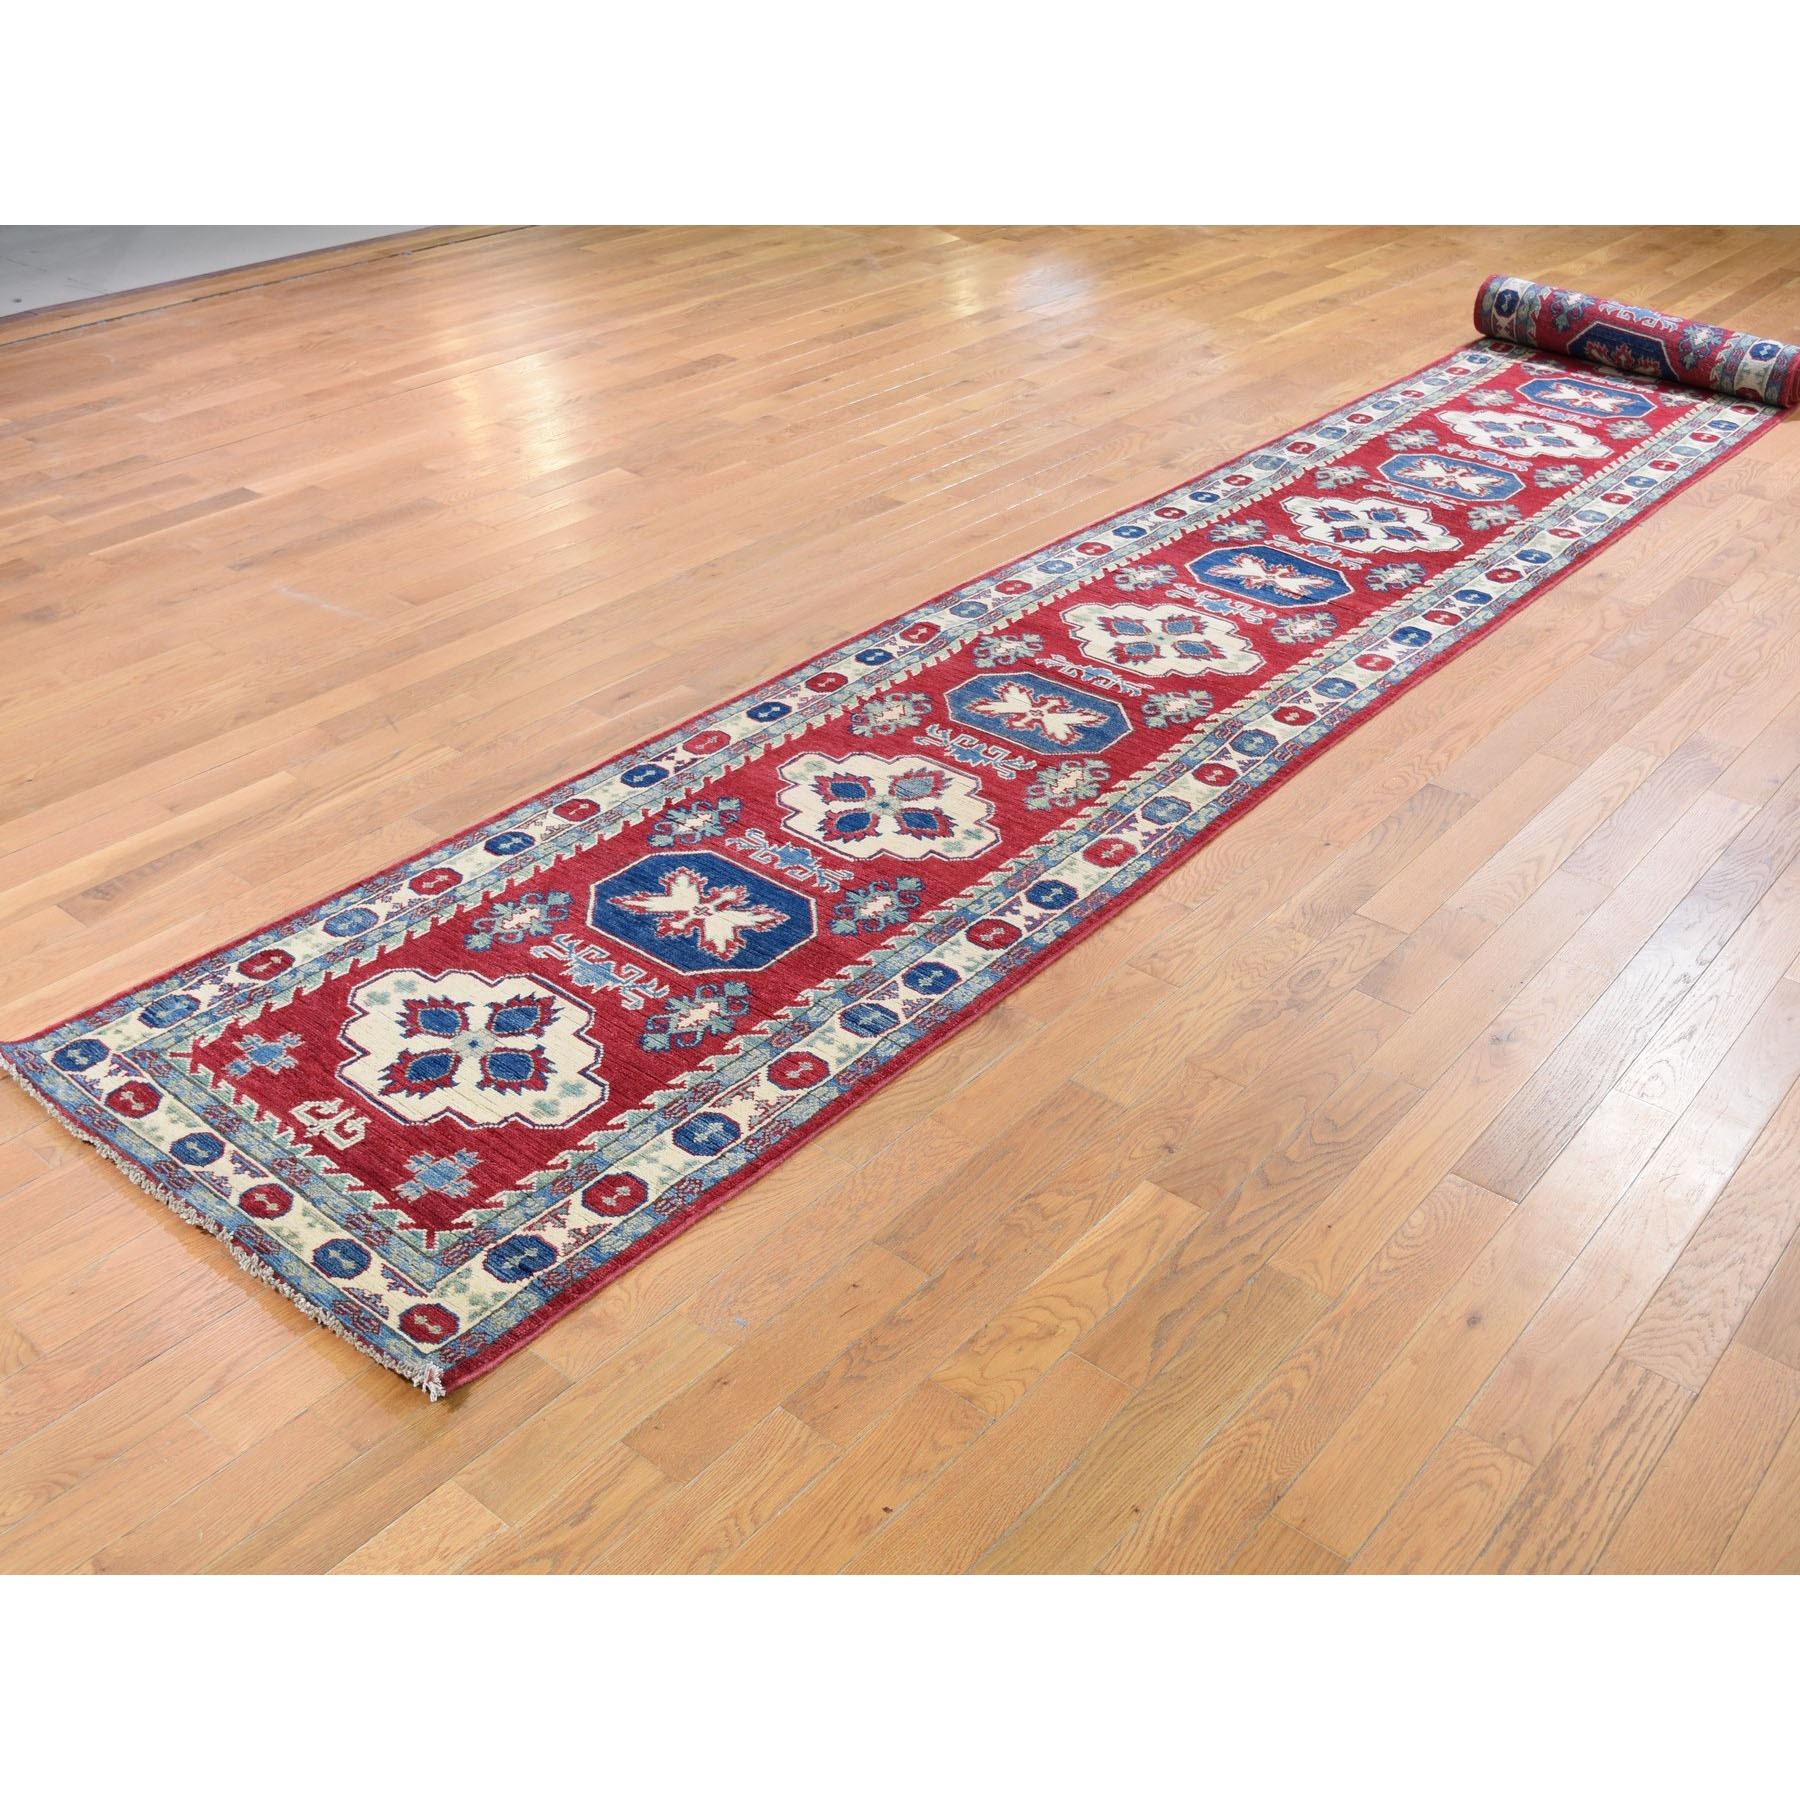 "2'8""x20' Red Kazak Tribal Design XL Runner Pure Wool Hand Knotted Oriental Rug"